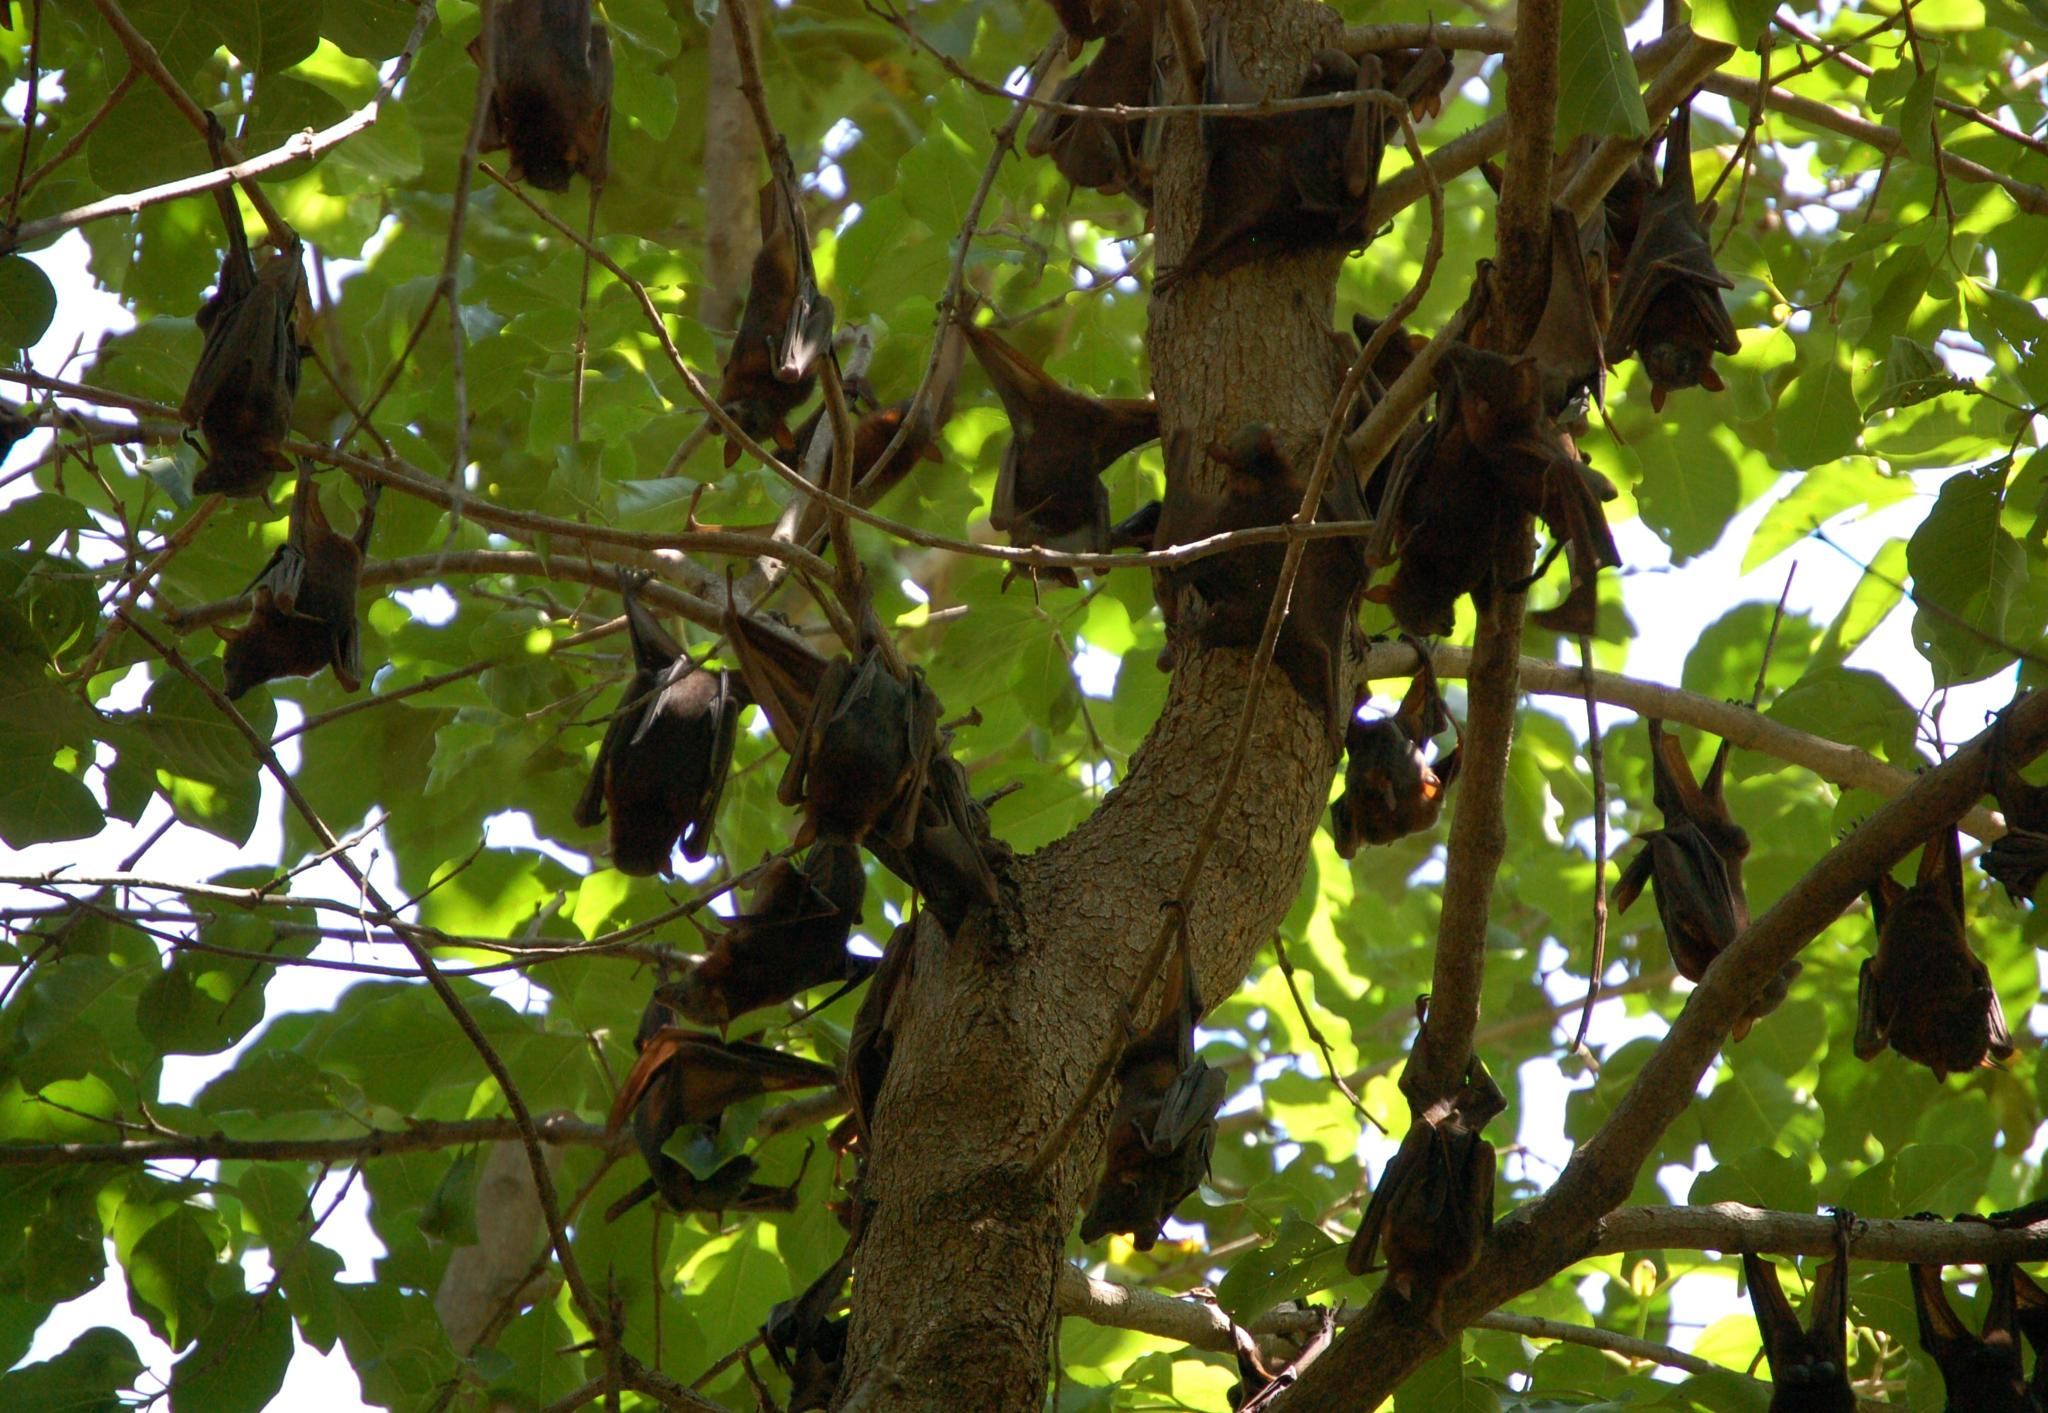 Fruit Bats at Kununurra, Western Australia by Zoid359WA